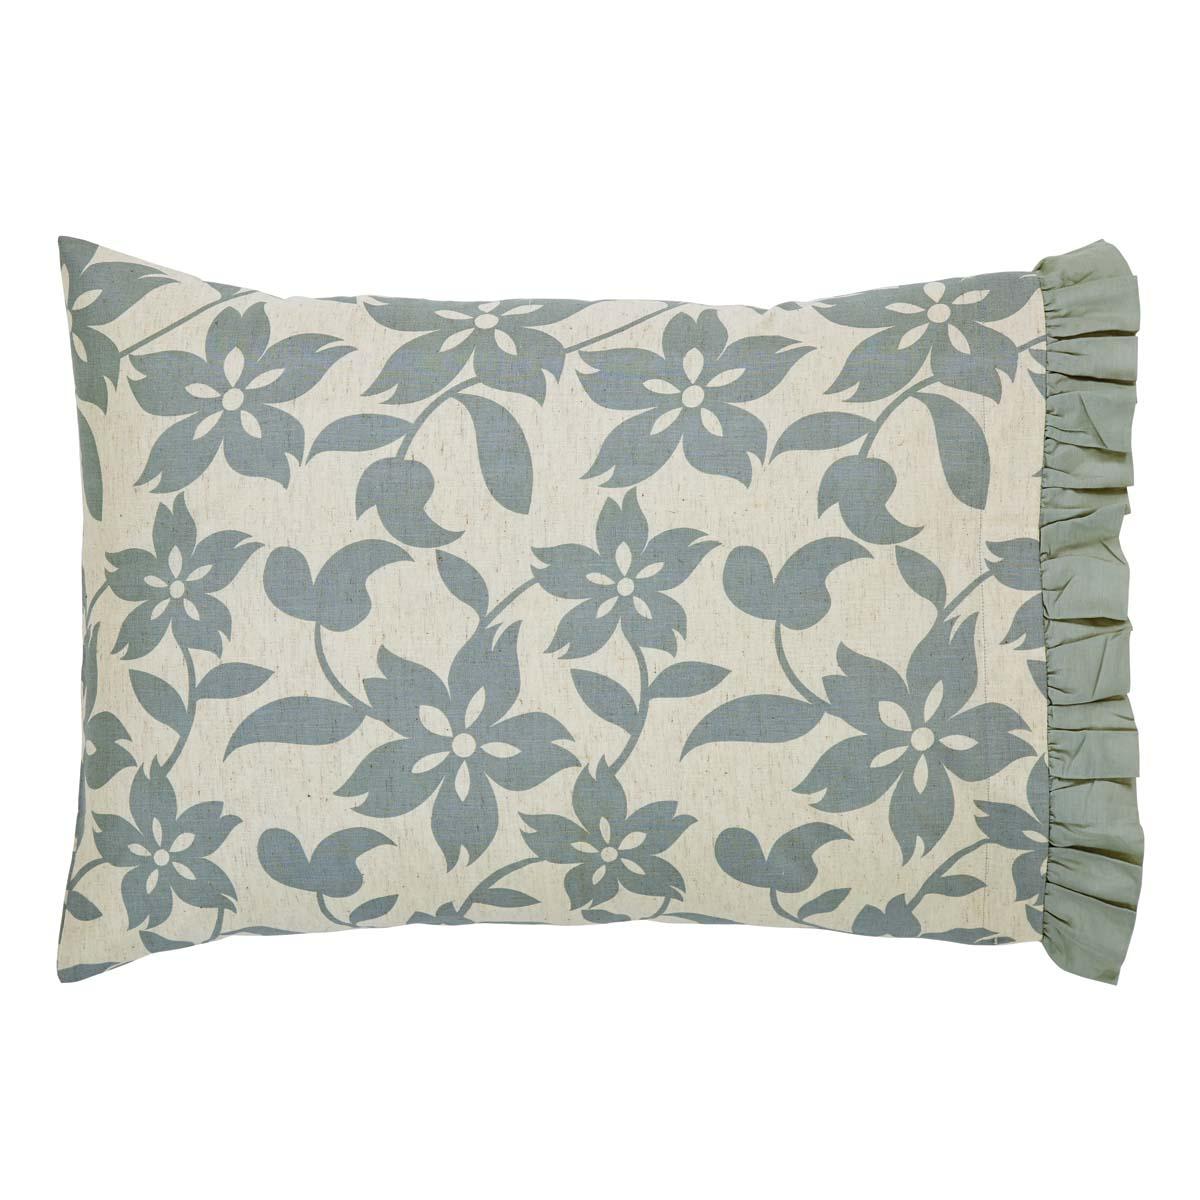 Briar Sage Standard Pillow Case Set of 2 21x30